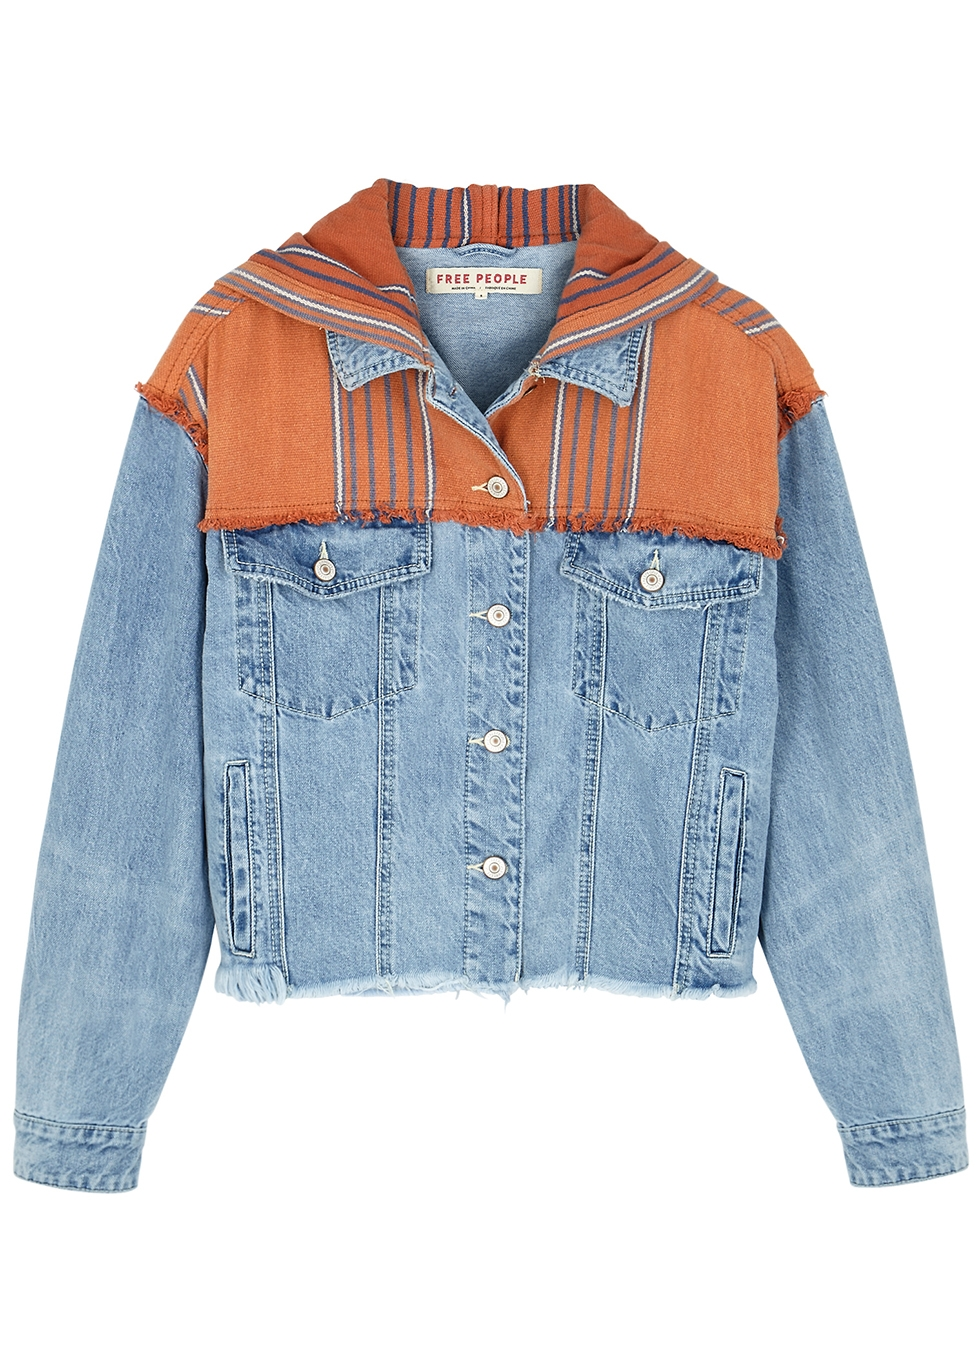 Baja blue hooded denim jacket - Free People